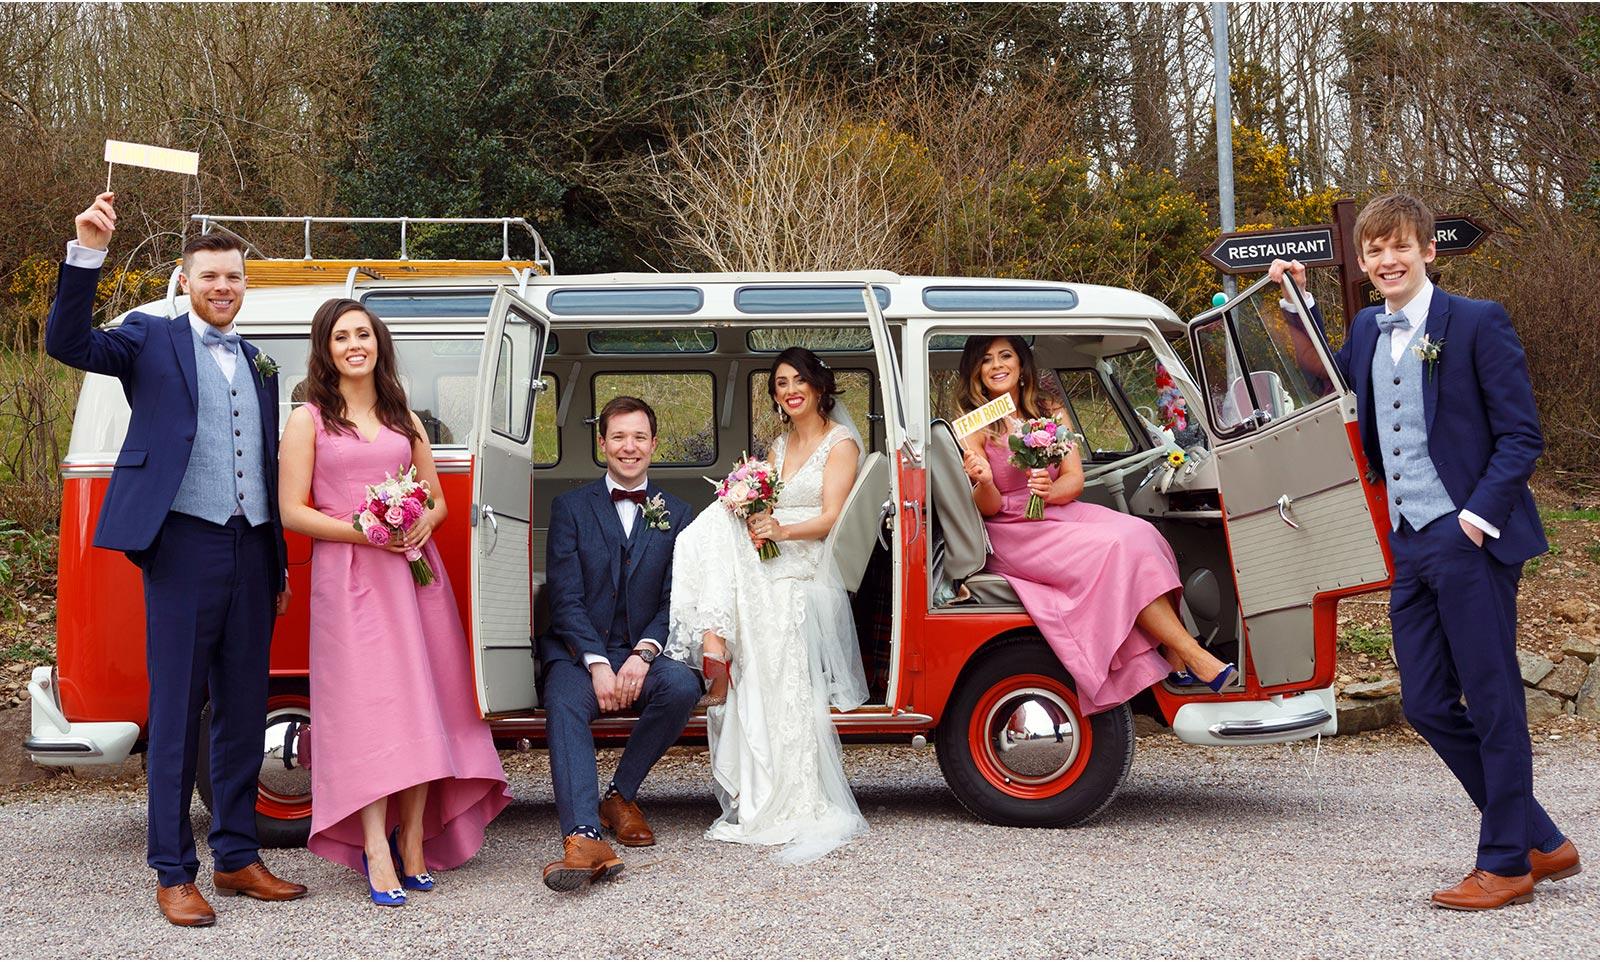 Bridal Party pose on VW campervan